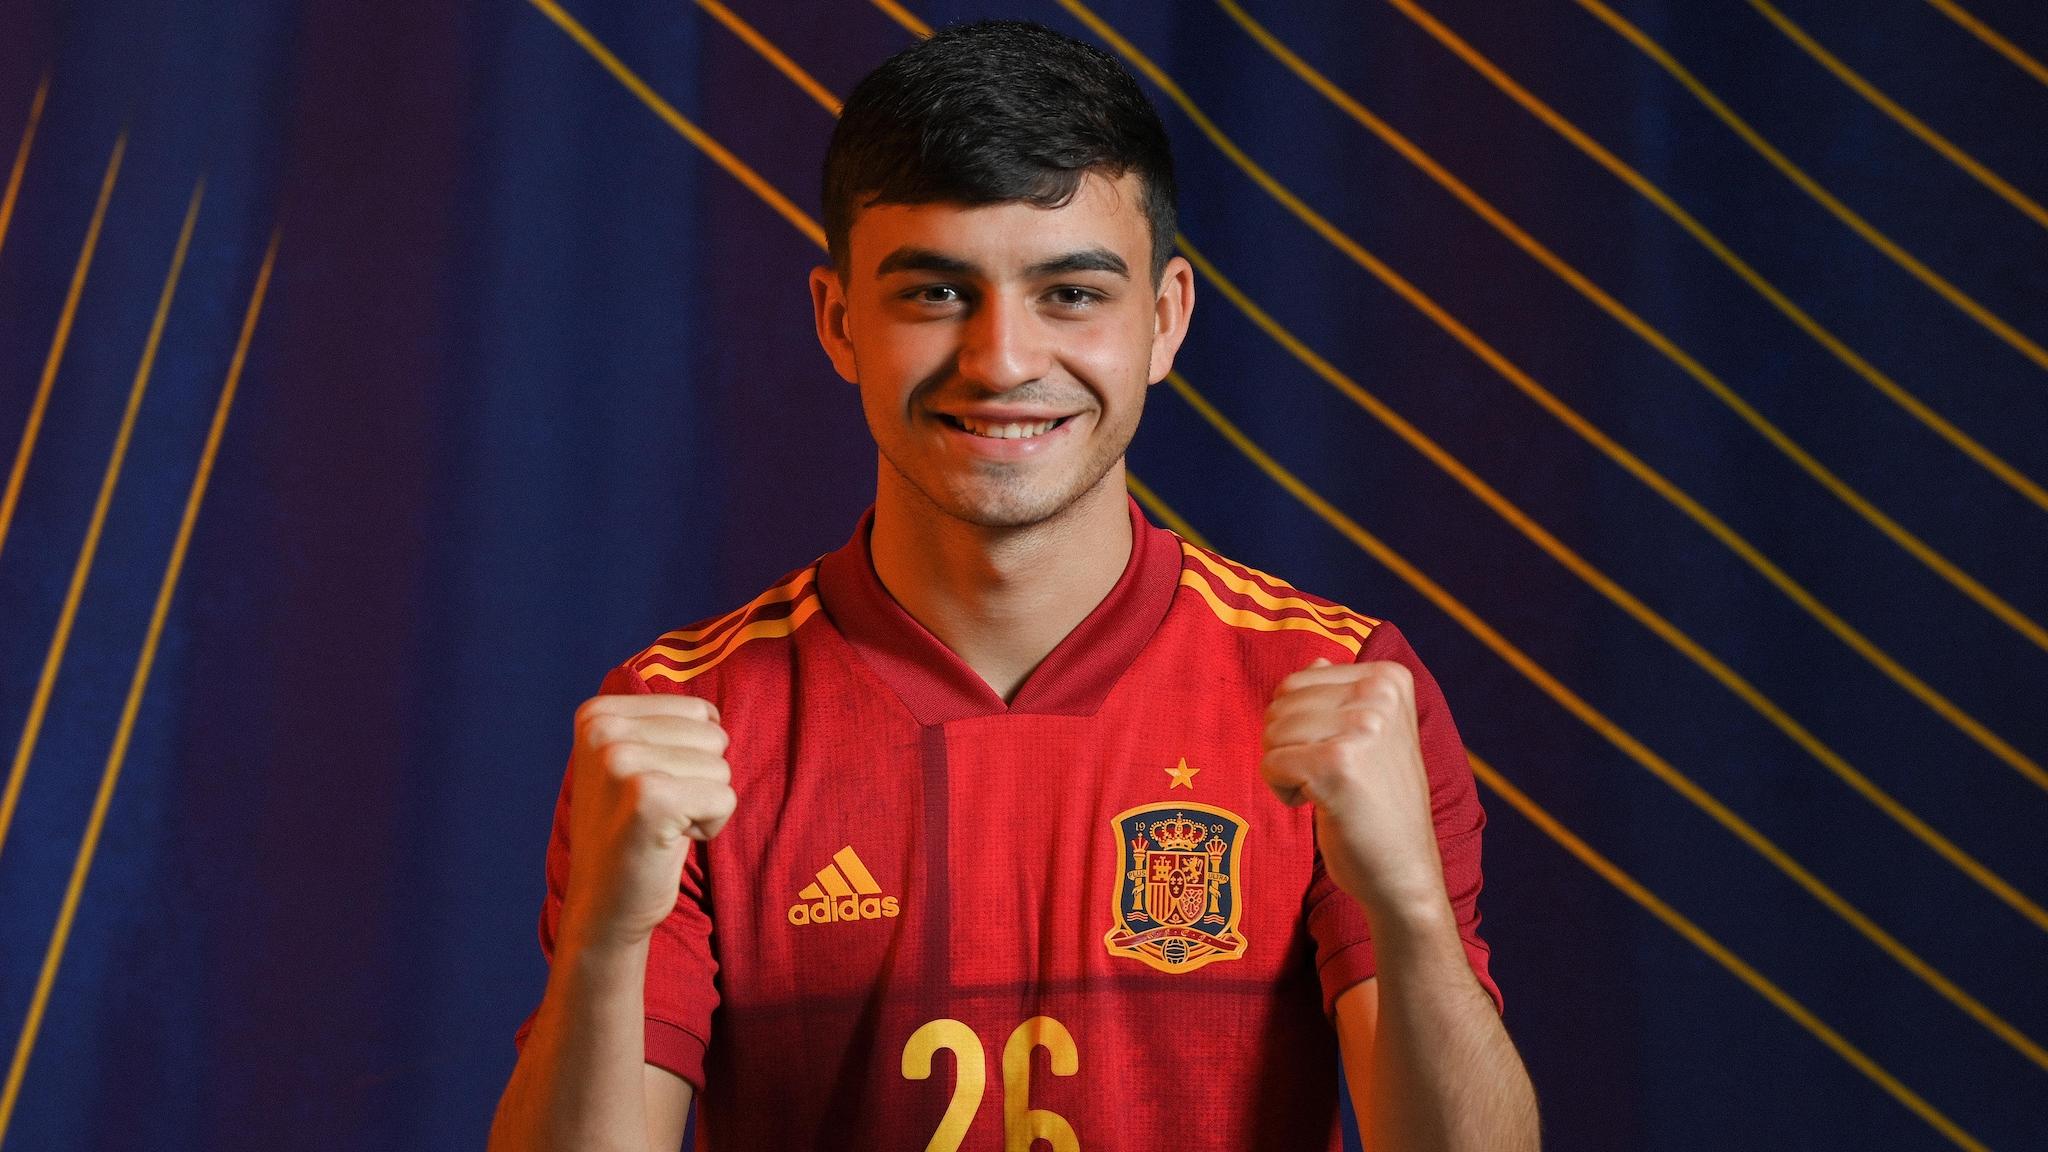 An ode to Pedri: a player to make football lovers swoon | UEFA EURO 2020 |  UEFA.com